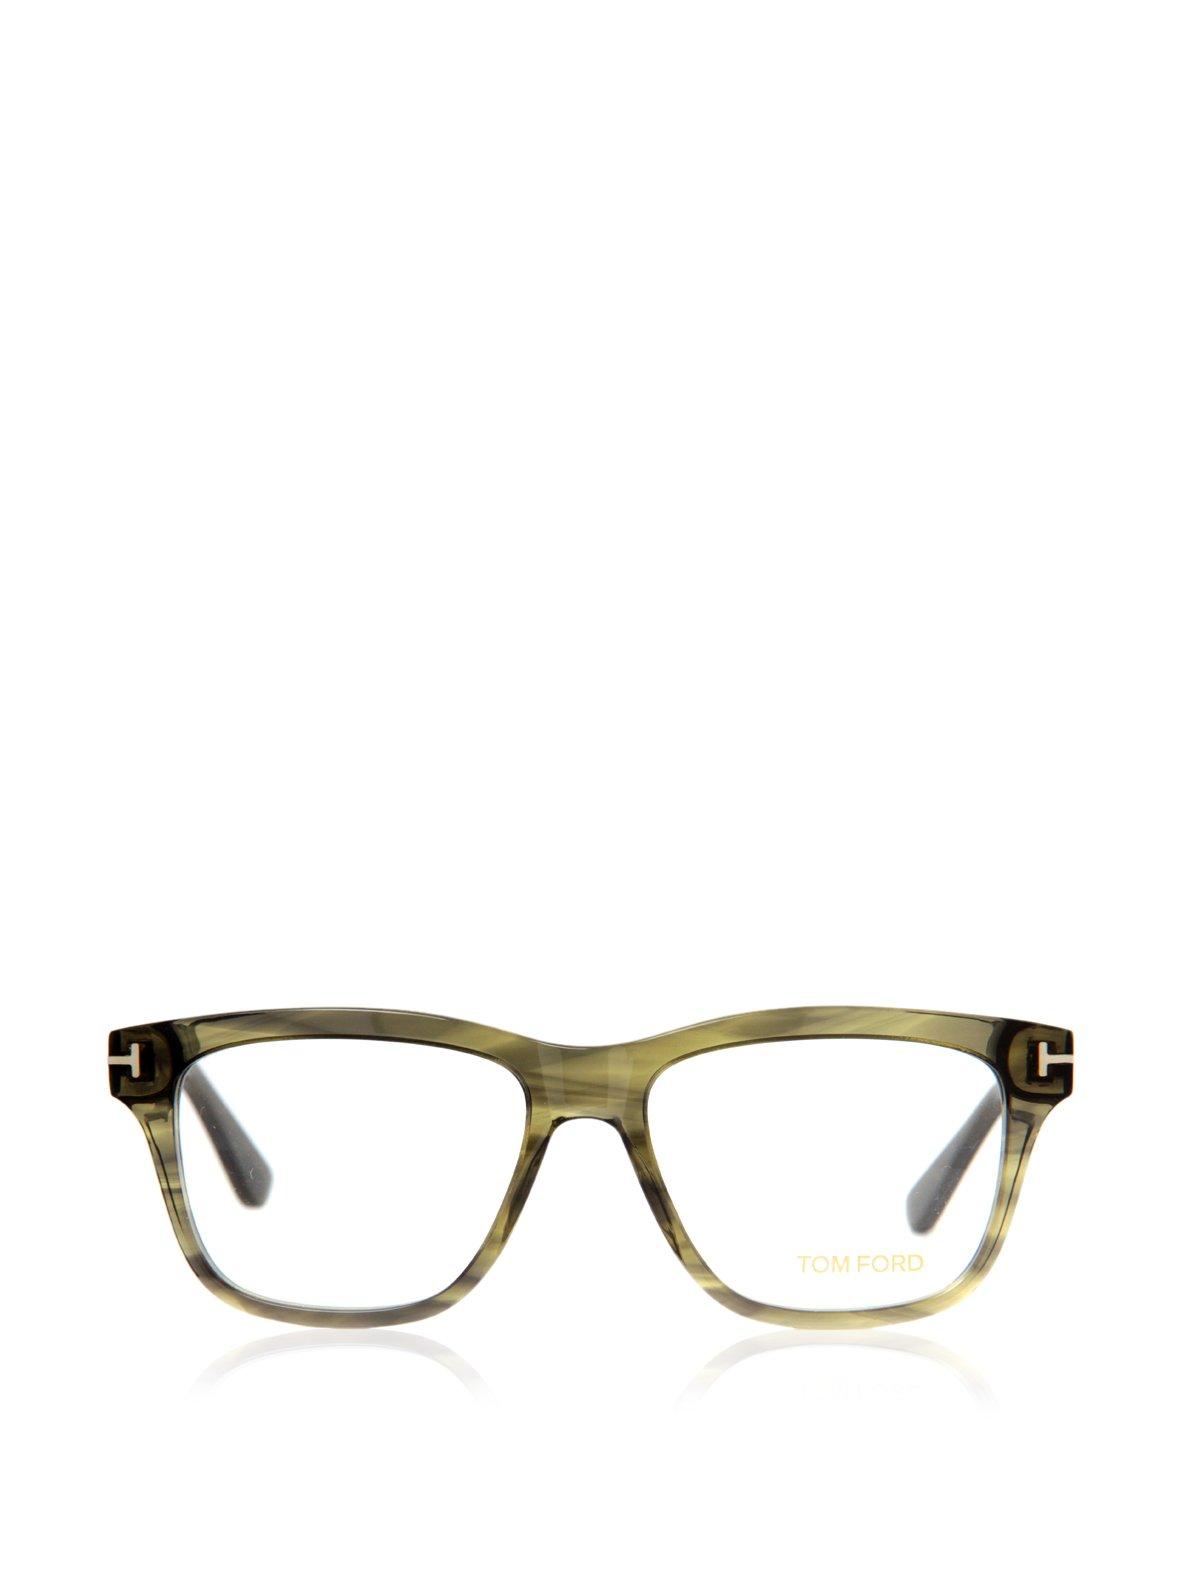 Tom Ford Eyeglasses TF 5372 Eyeglasses 098 Striped Green 54mm by Tom (Image #3)